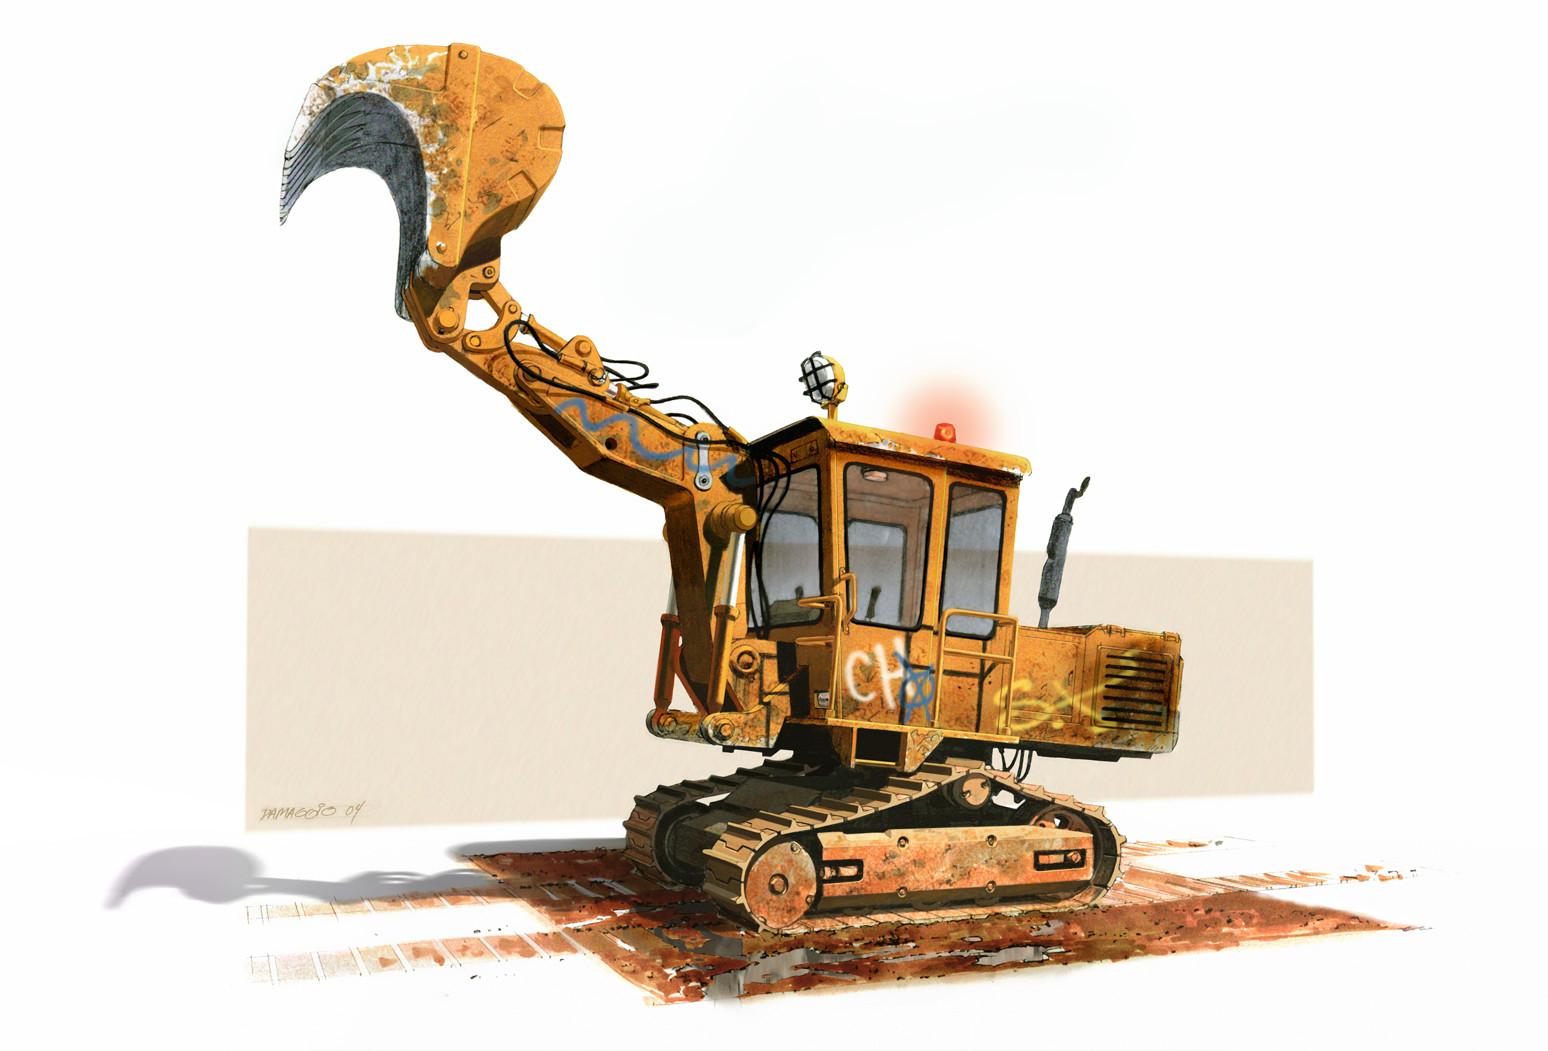 Rodolfo damaggio mh excavator v01rd